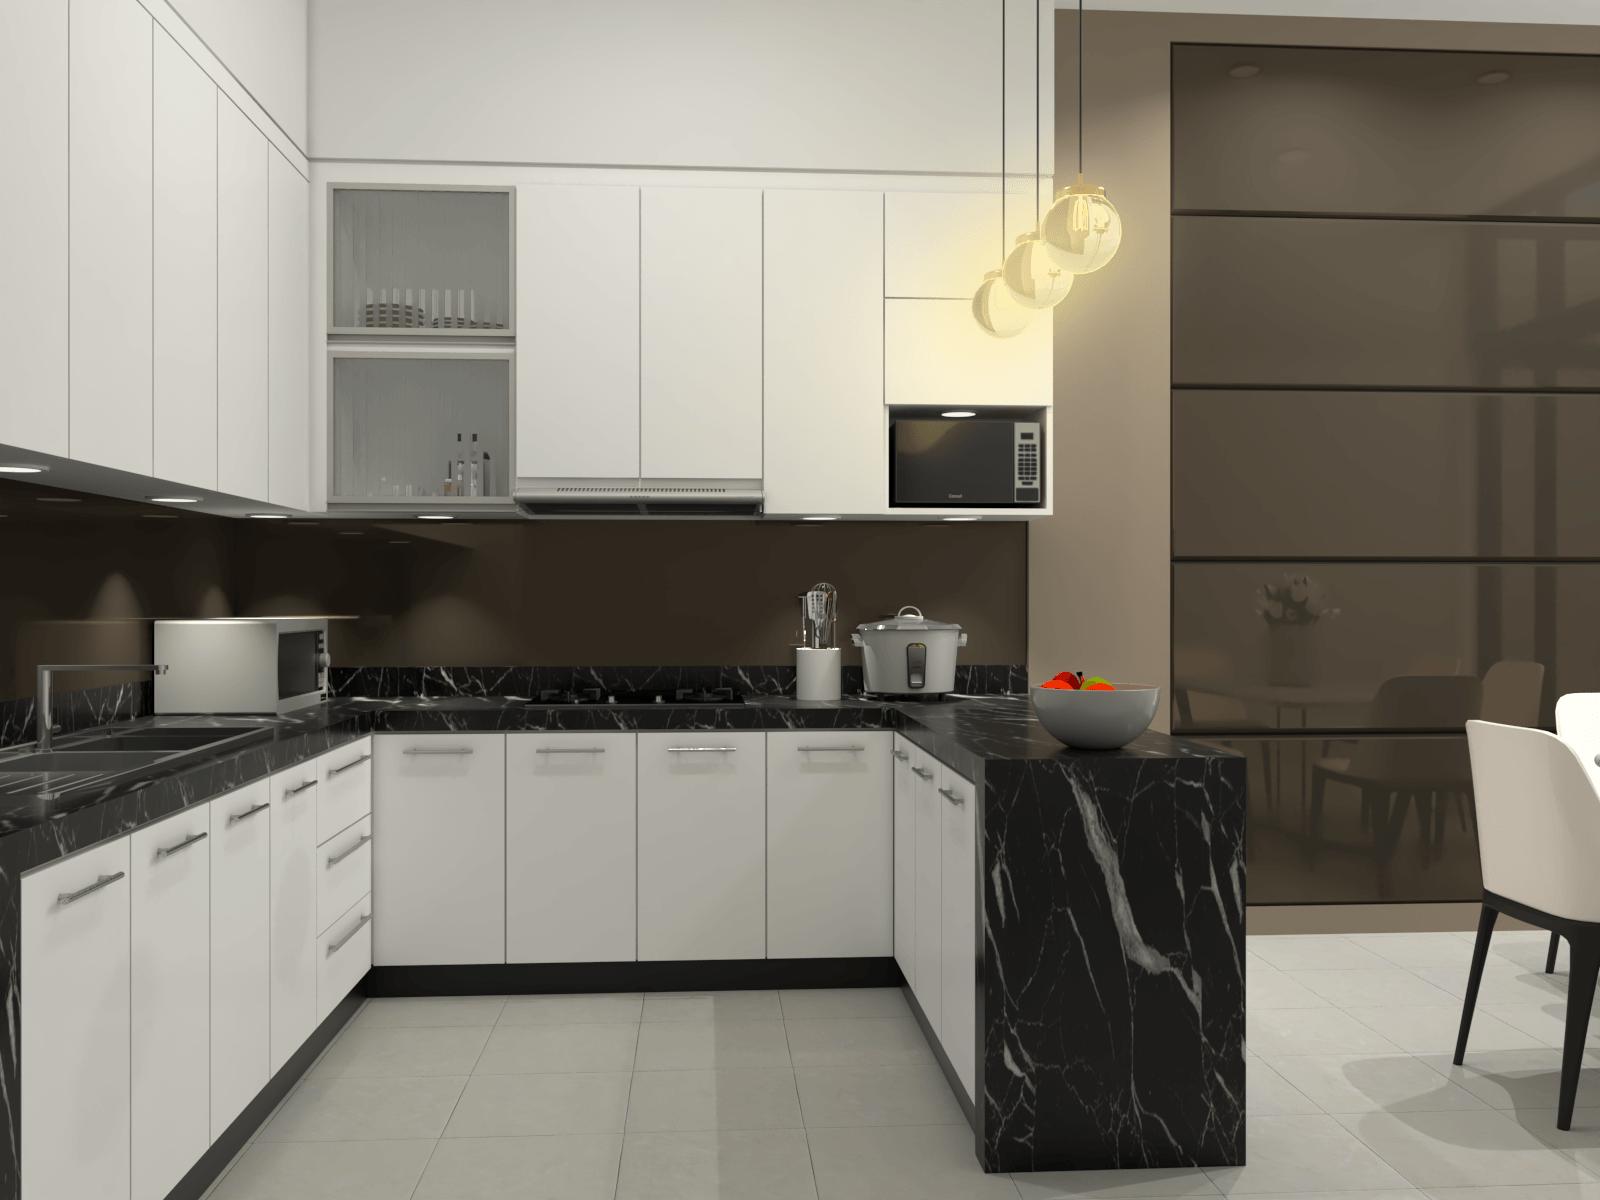 Intuisi Studio Kitchen & Dining Room - Mr. A Surabaya, Kota Sby, Jawa Timur, Indonesia Surabaya, Kota Sby, Jawa Timur, Indonesia Intuisi-Studio-Kitchen-Dining-Room-Mr-A   132999